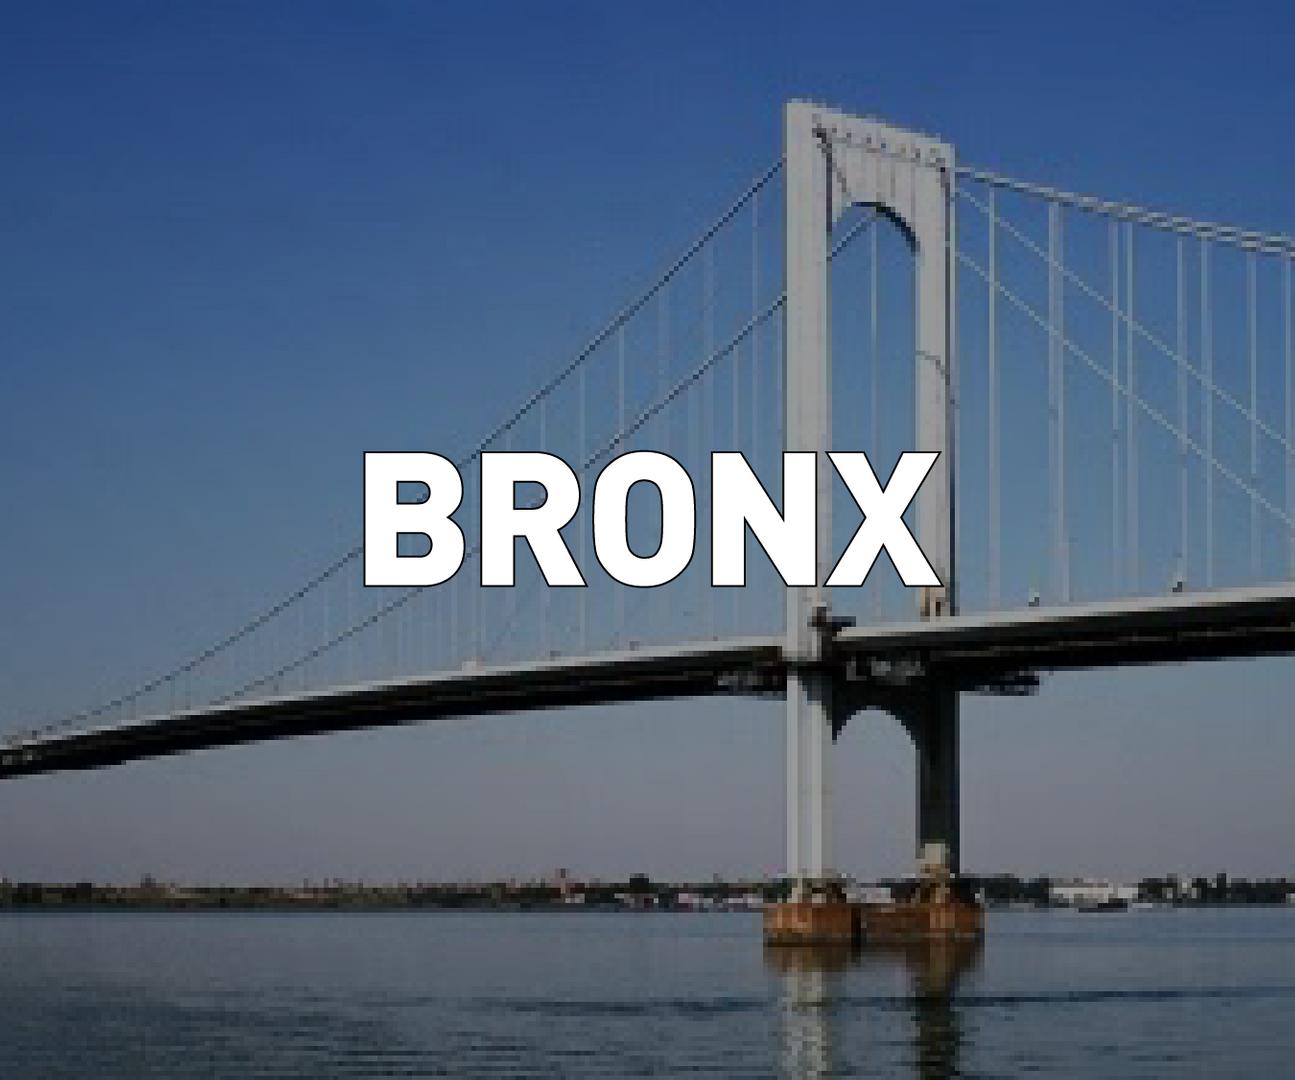 Bronx Bridge